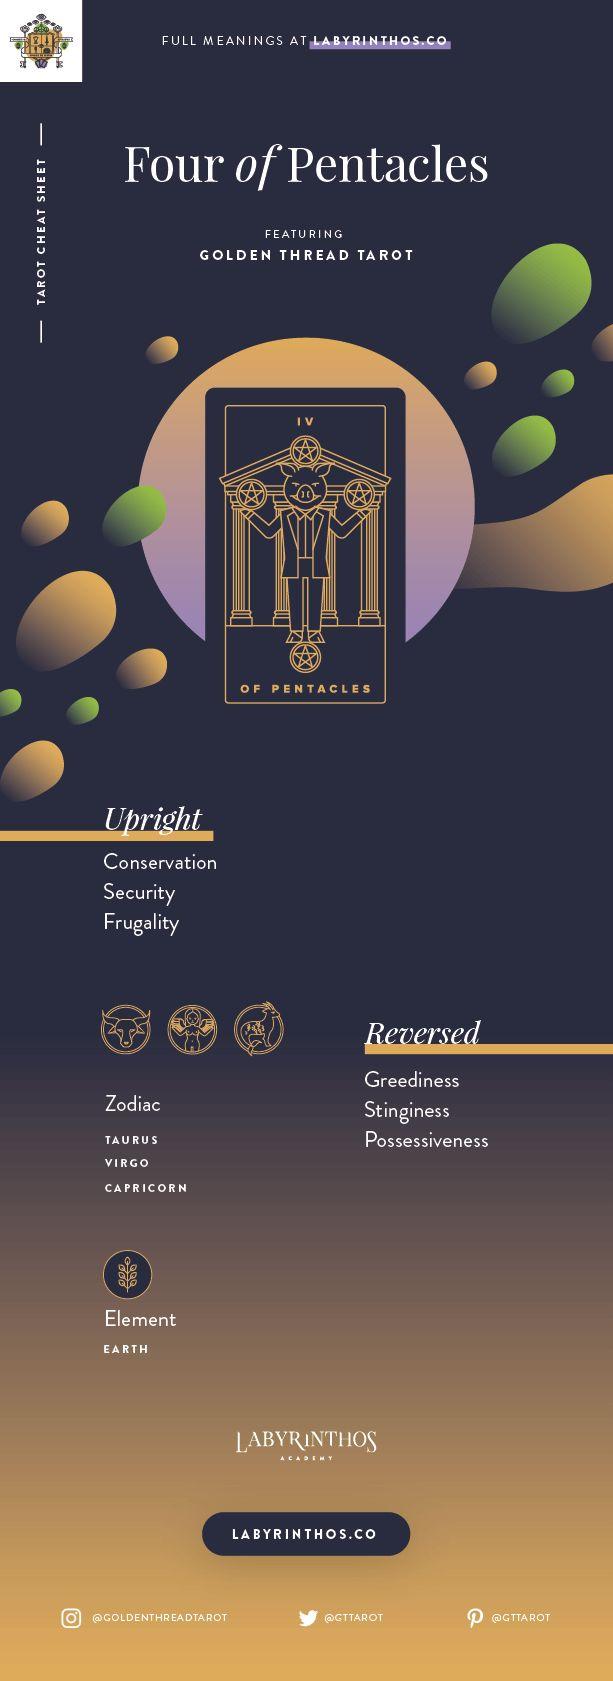 Four of Pentacles Meaning - Tarot Card Meanings Cheat Sheet. Art from Golden Thread Tarot.